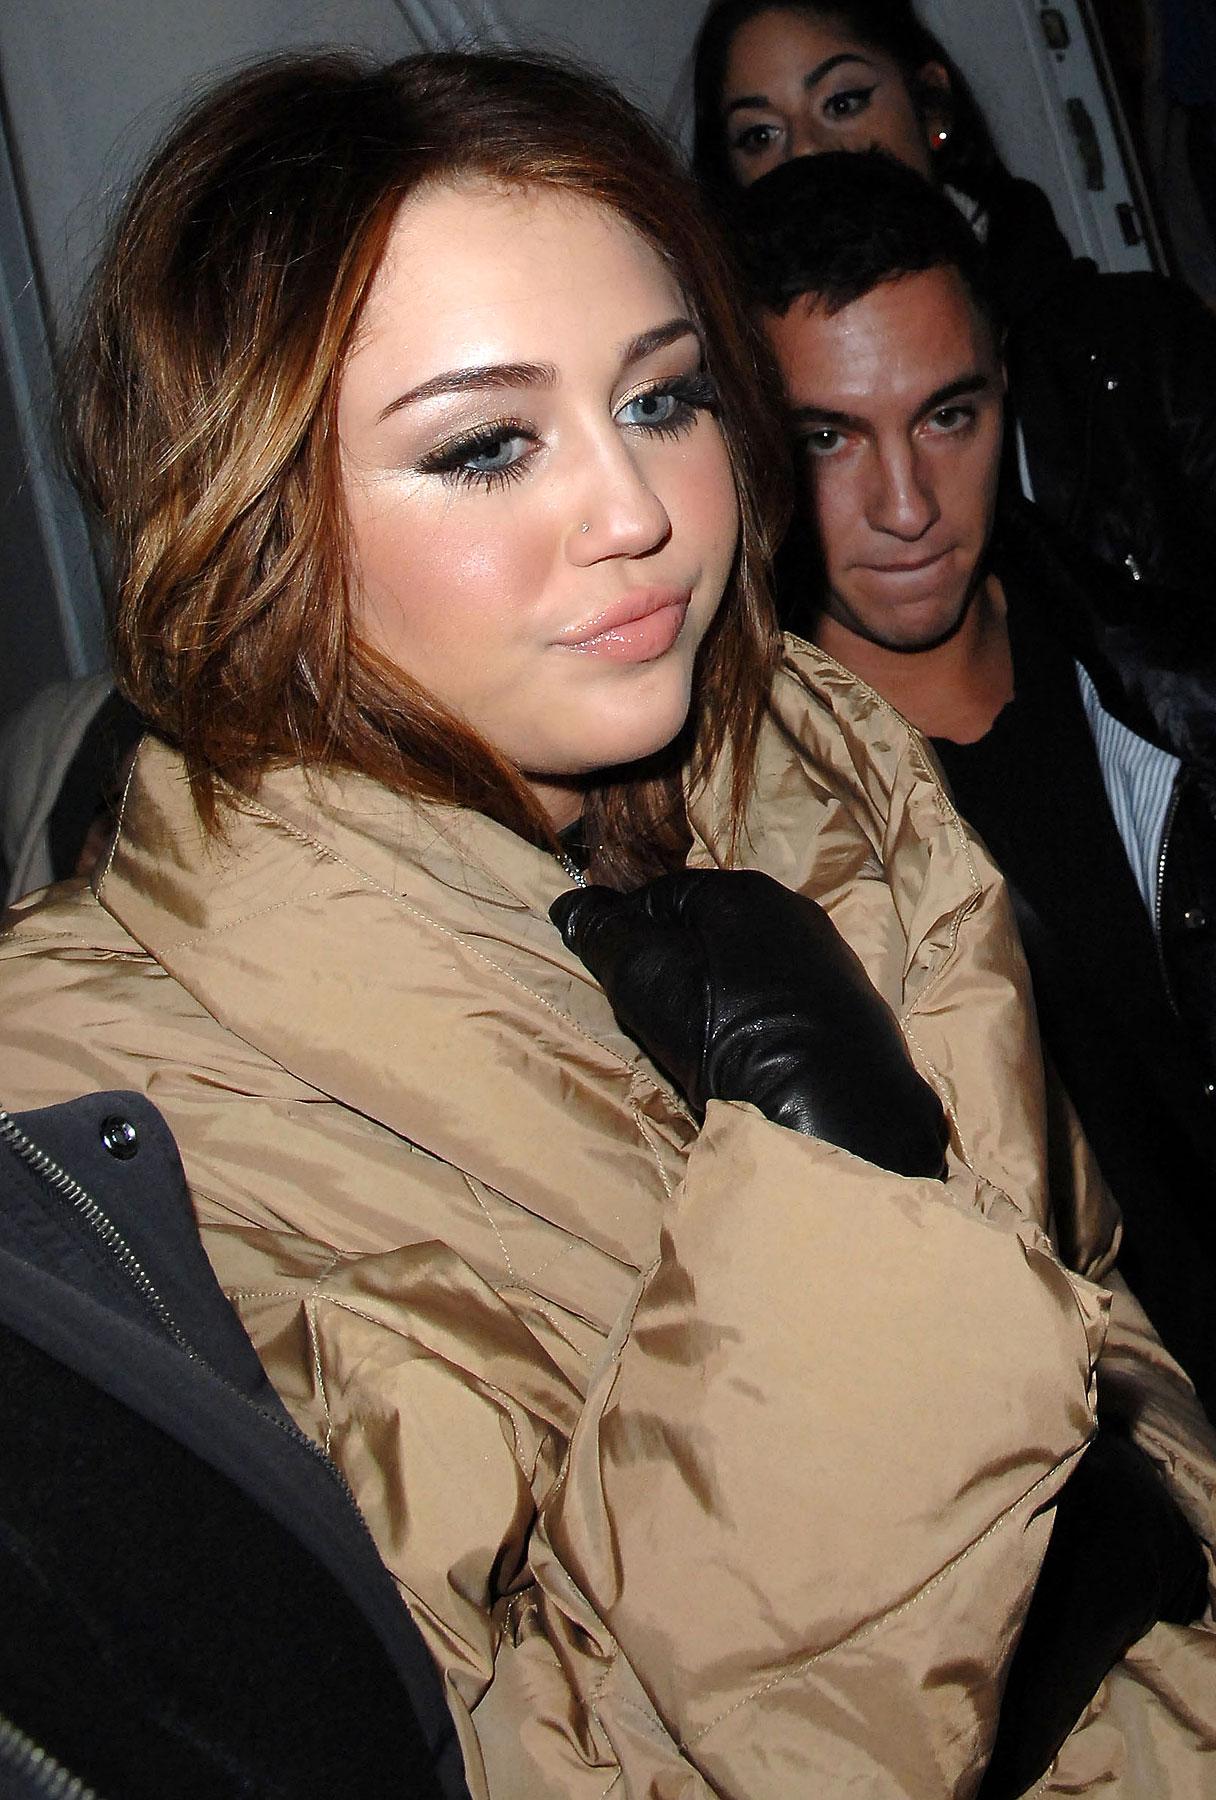 Miley Cyrus Swears She Doesn't Miss Twitter